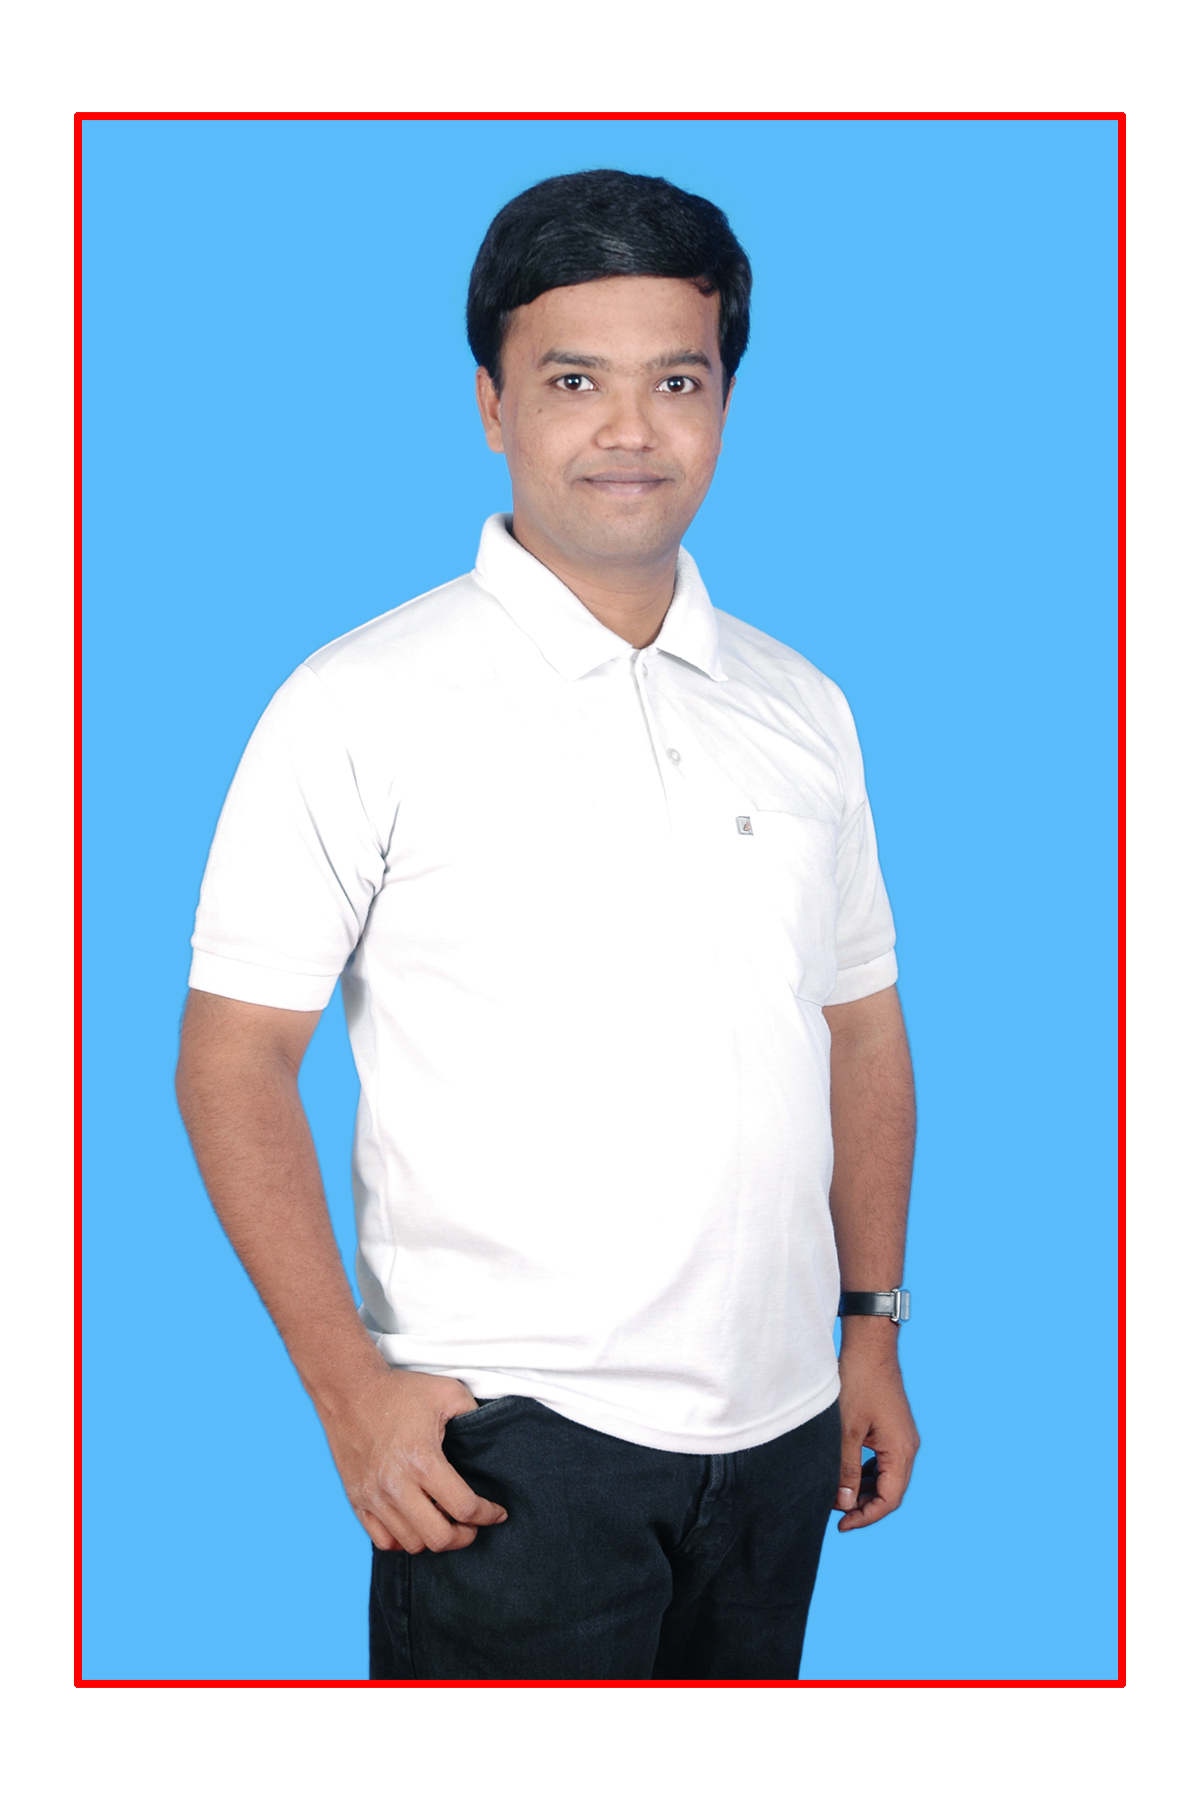 [New GRIQ member]: Sudarshan Murthy